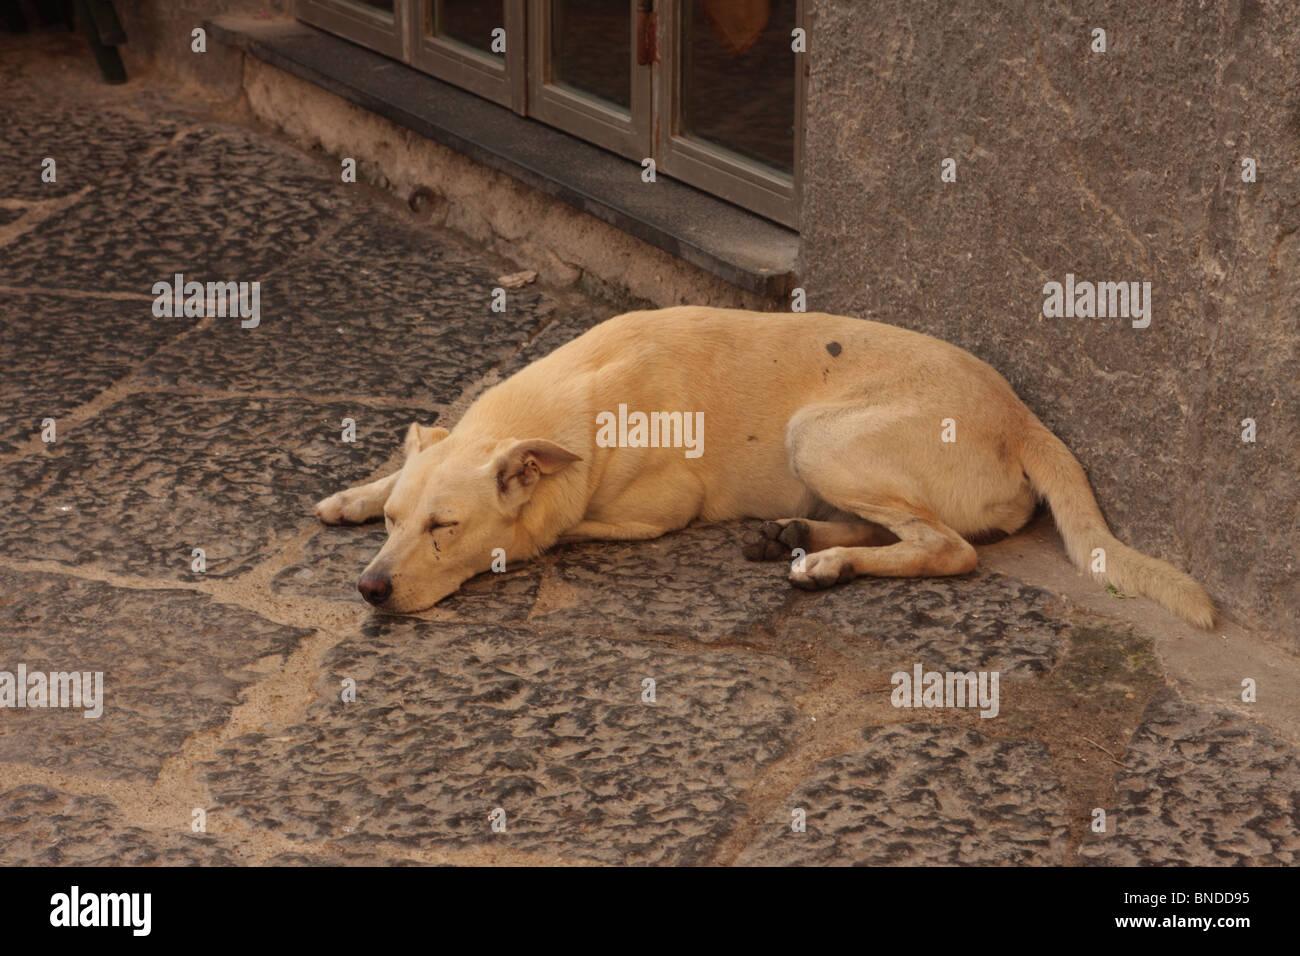 Stray dog asleep Naples Italy - Stock Image